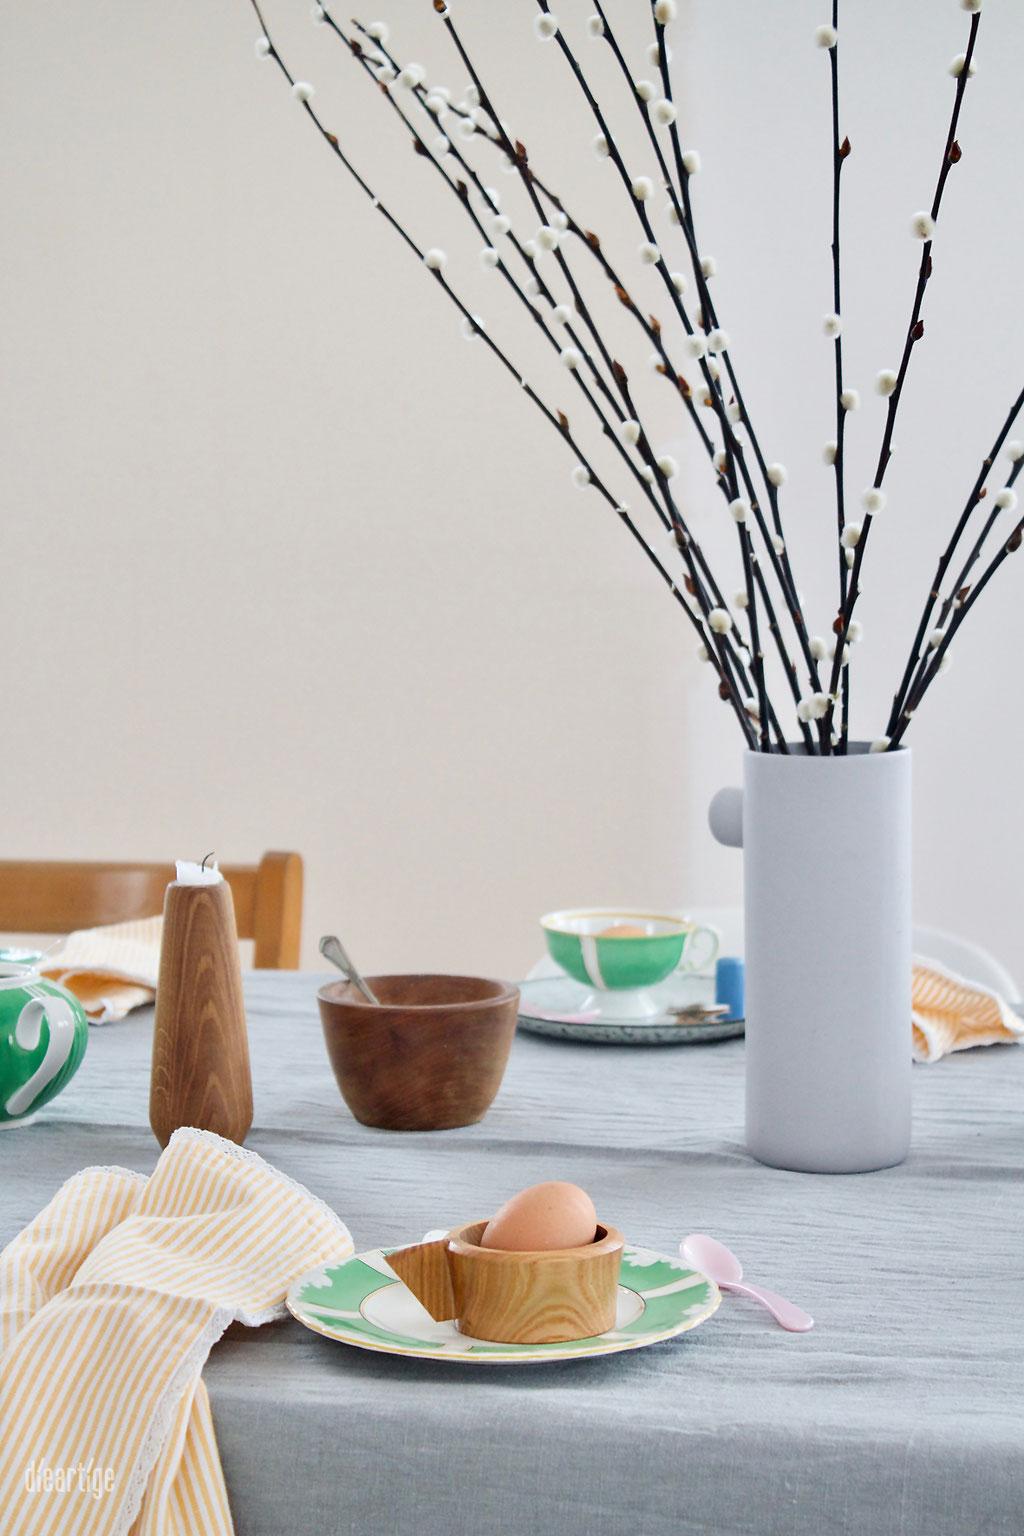 dieartigeBLOG - Oster//Frühlings-Tischdekoration | Handgefertigte Keramik, weiß-mattes Porzelan, Wachteleier